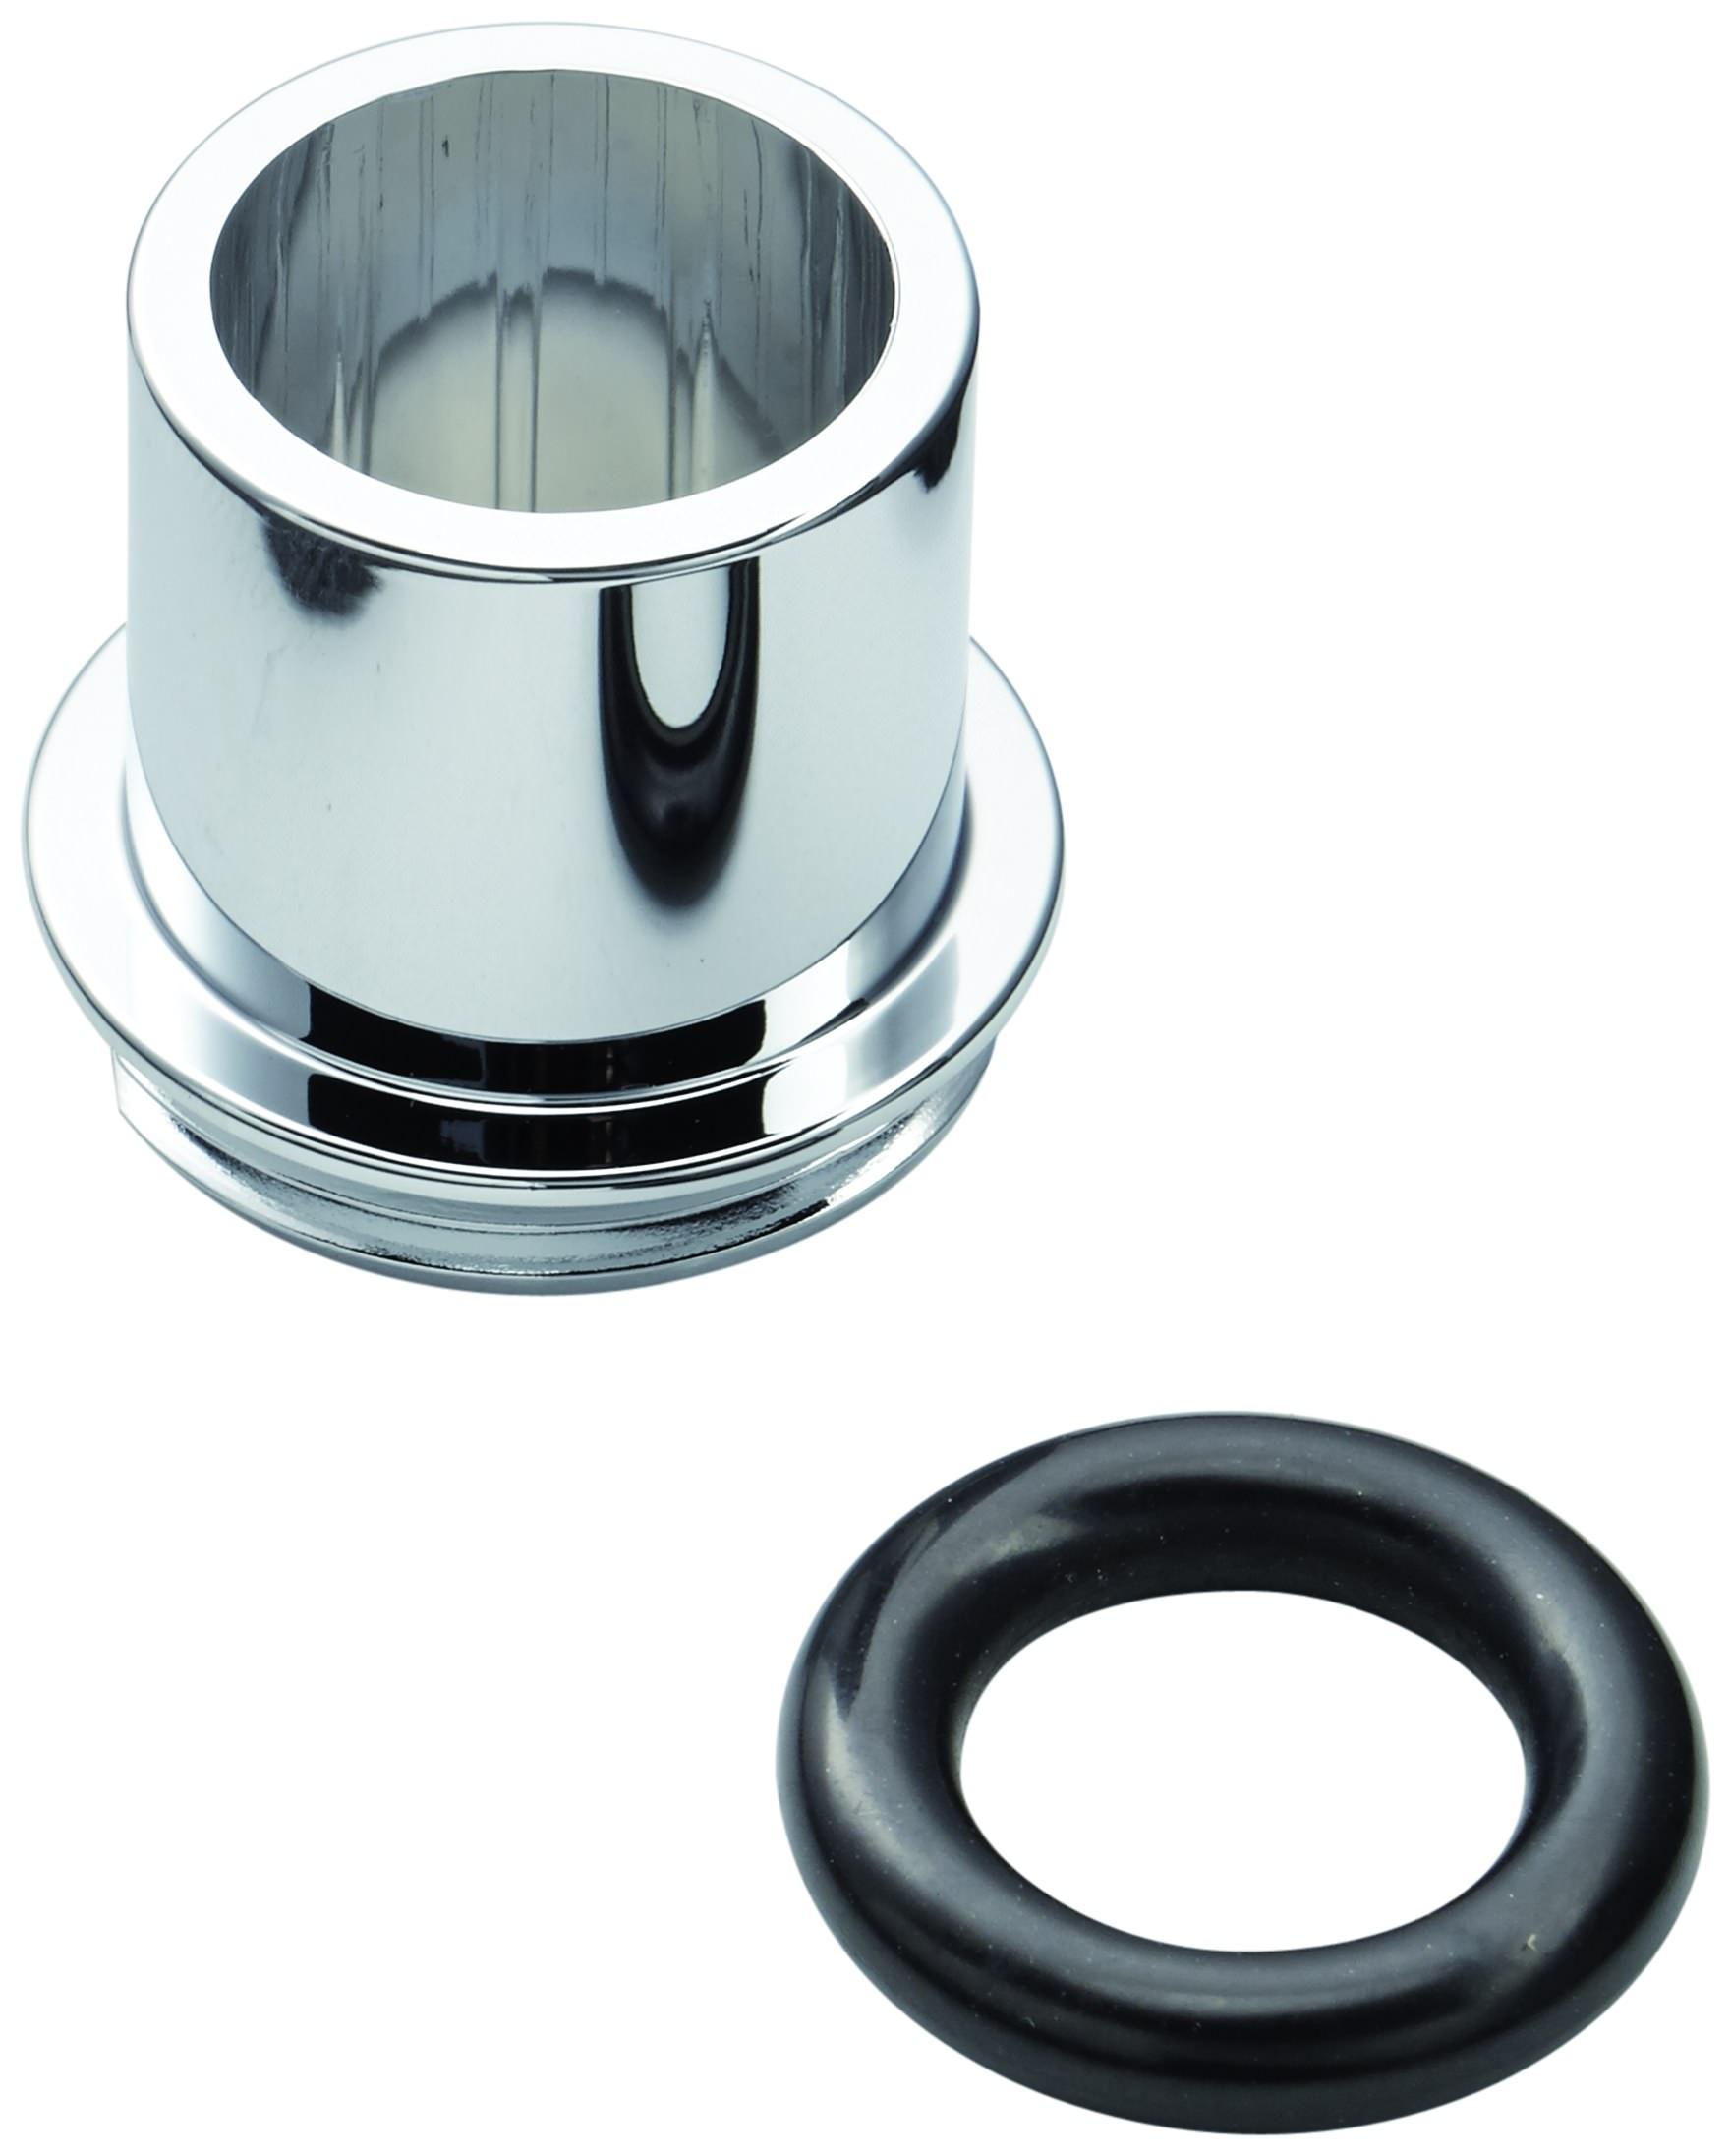 grohe rondo abgangsmutter f r urinal drucksp ler chrom 42344000. Black Bedroom Furniture Sets. Home Design Ideas